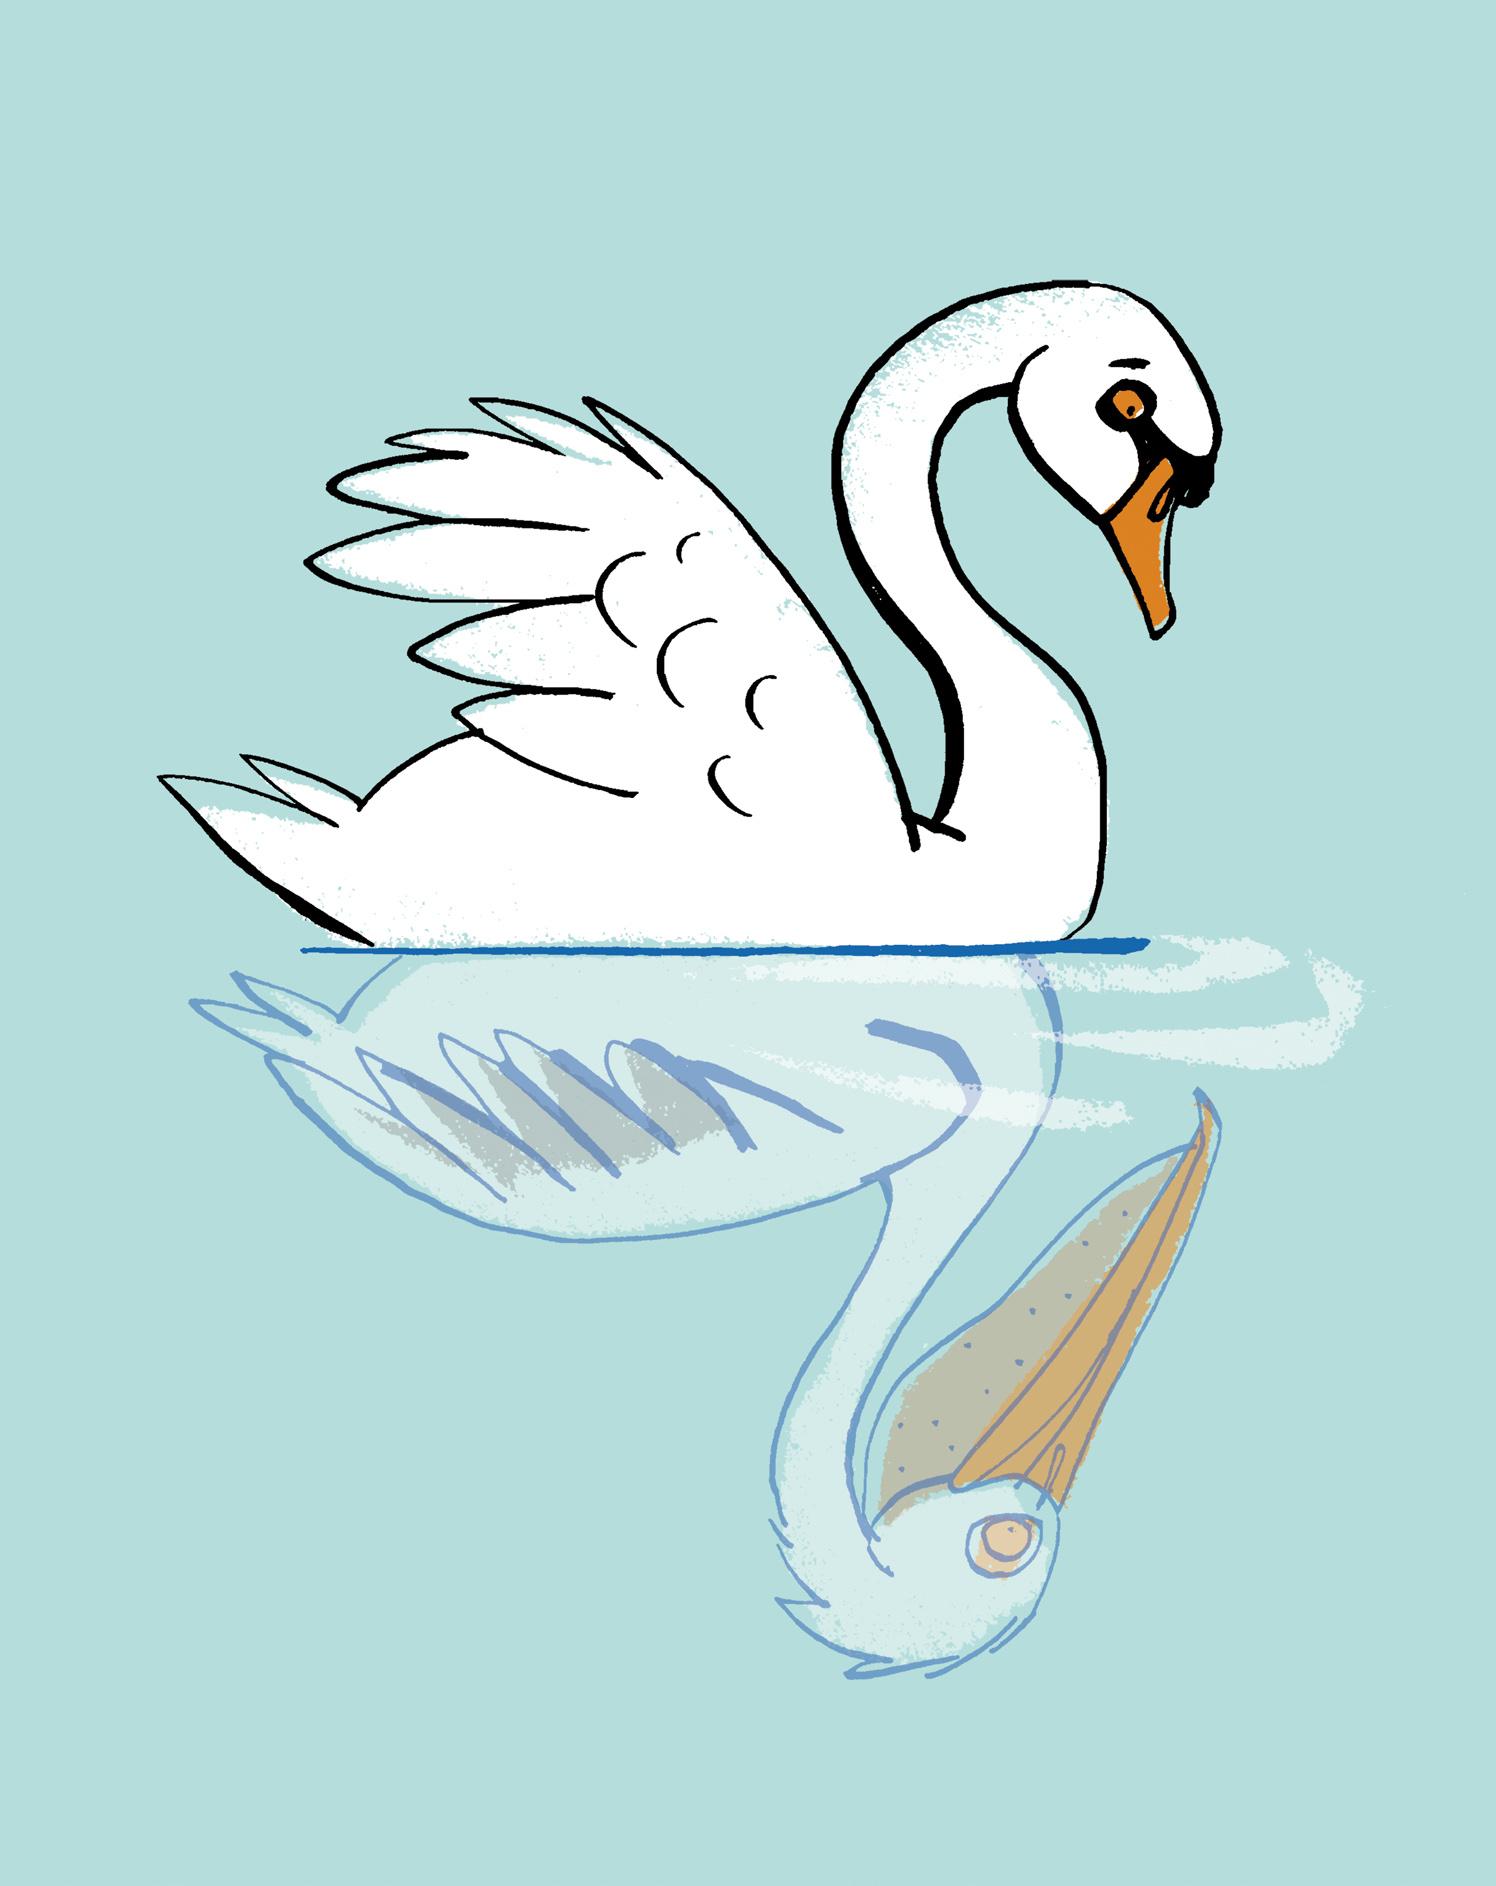 Distorted Self Image Swan